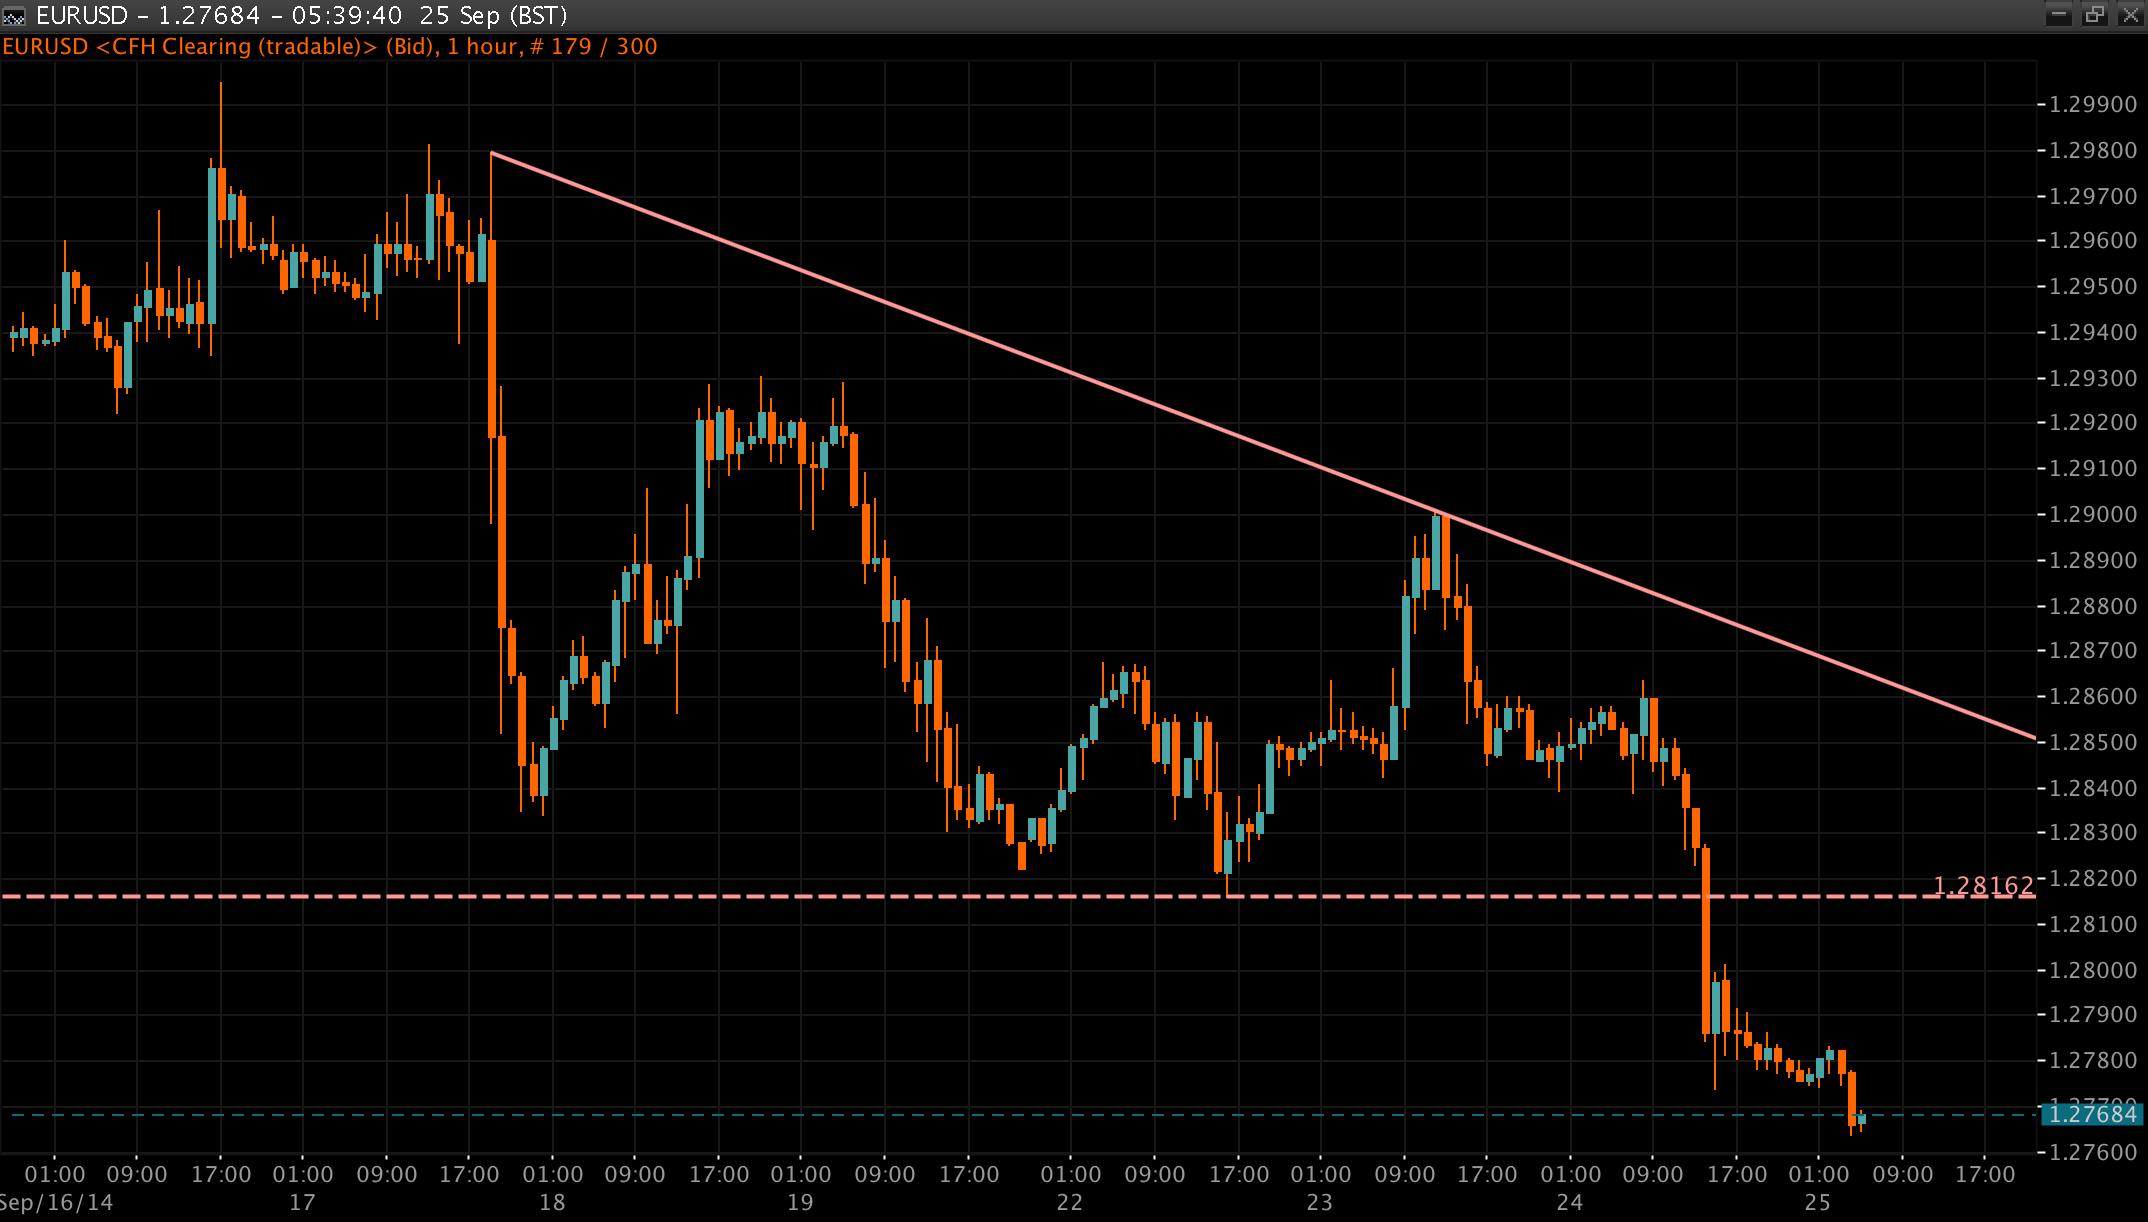 EUR/USD Chart 25 Sep 2014